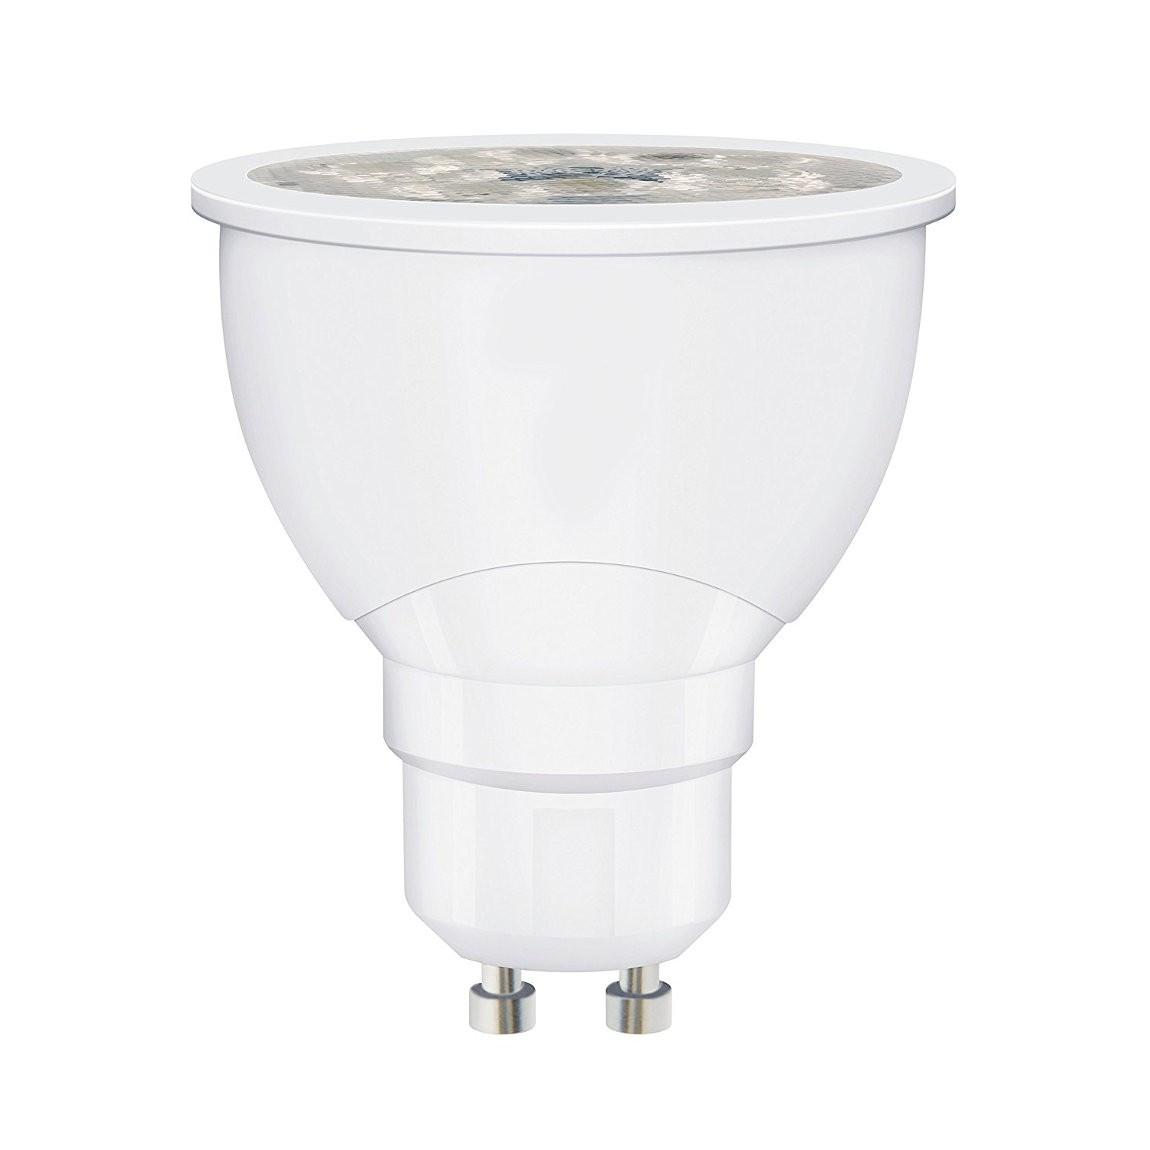 Osram Smart+ LED-Spot GU10 Multicolor - Weiß